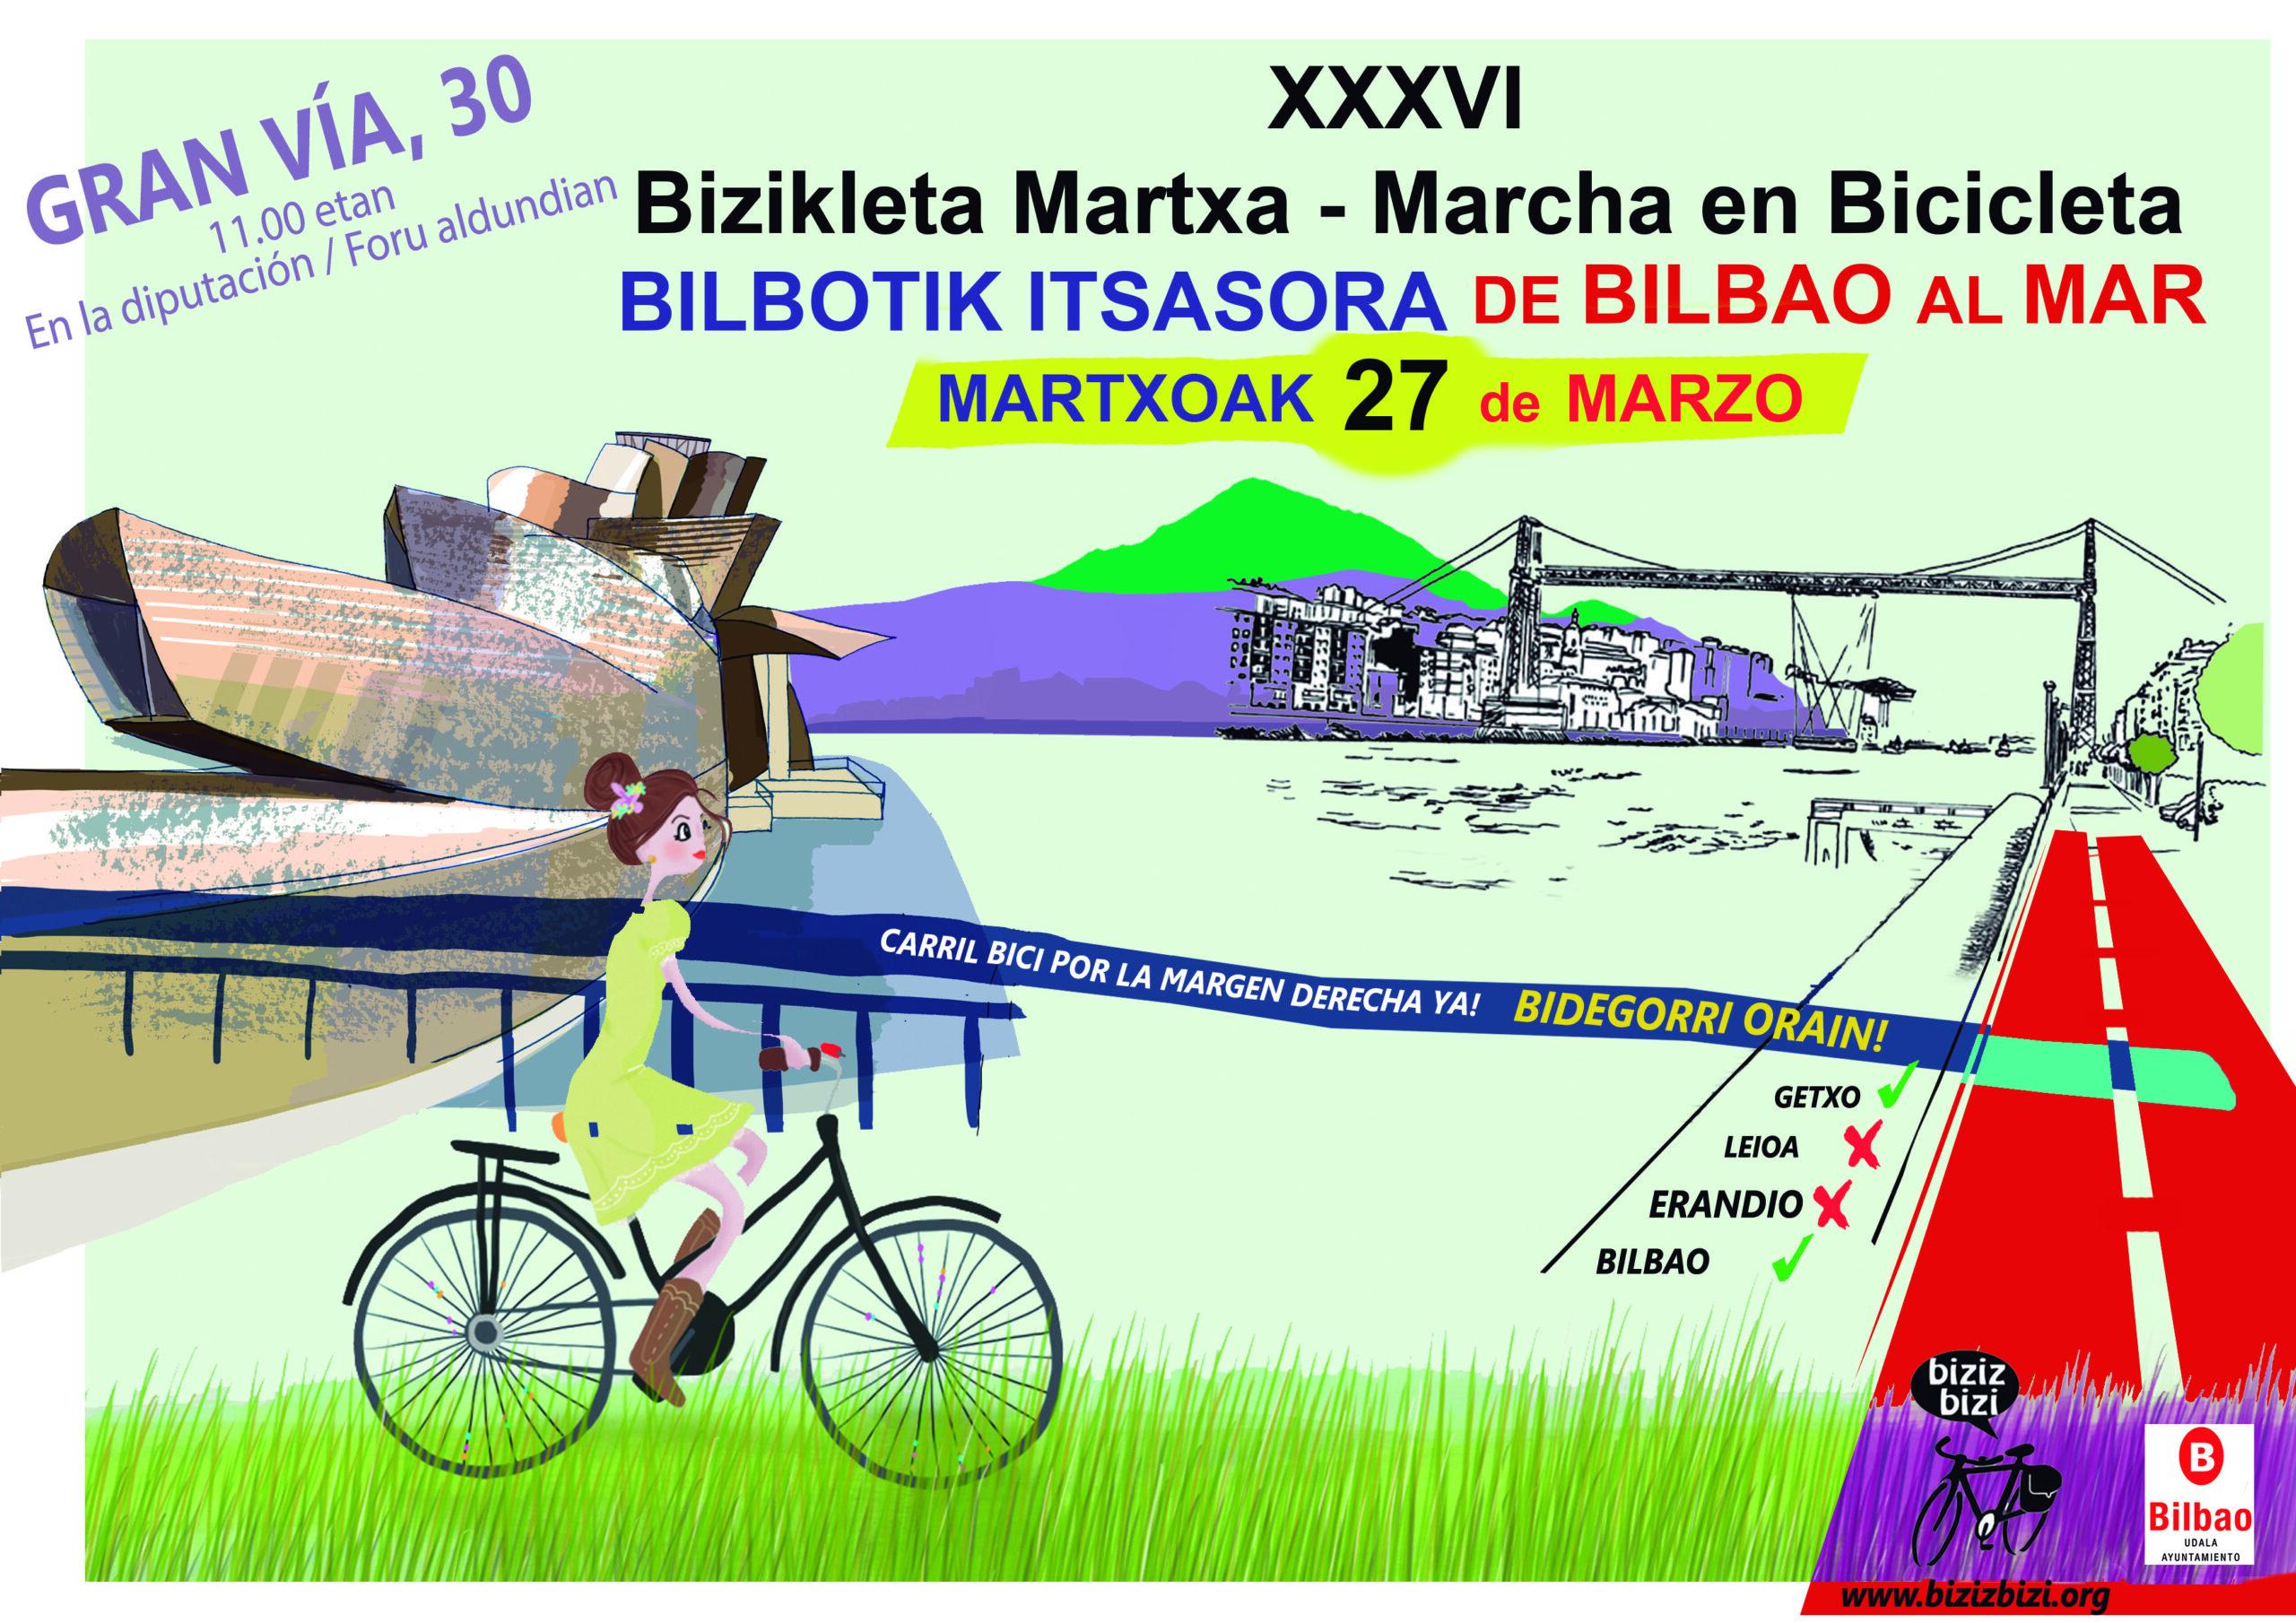 XXXVI Marcha #BilbotikItsasora